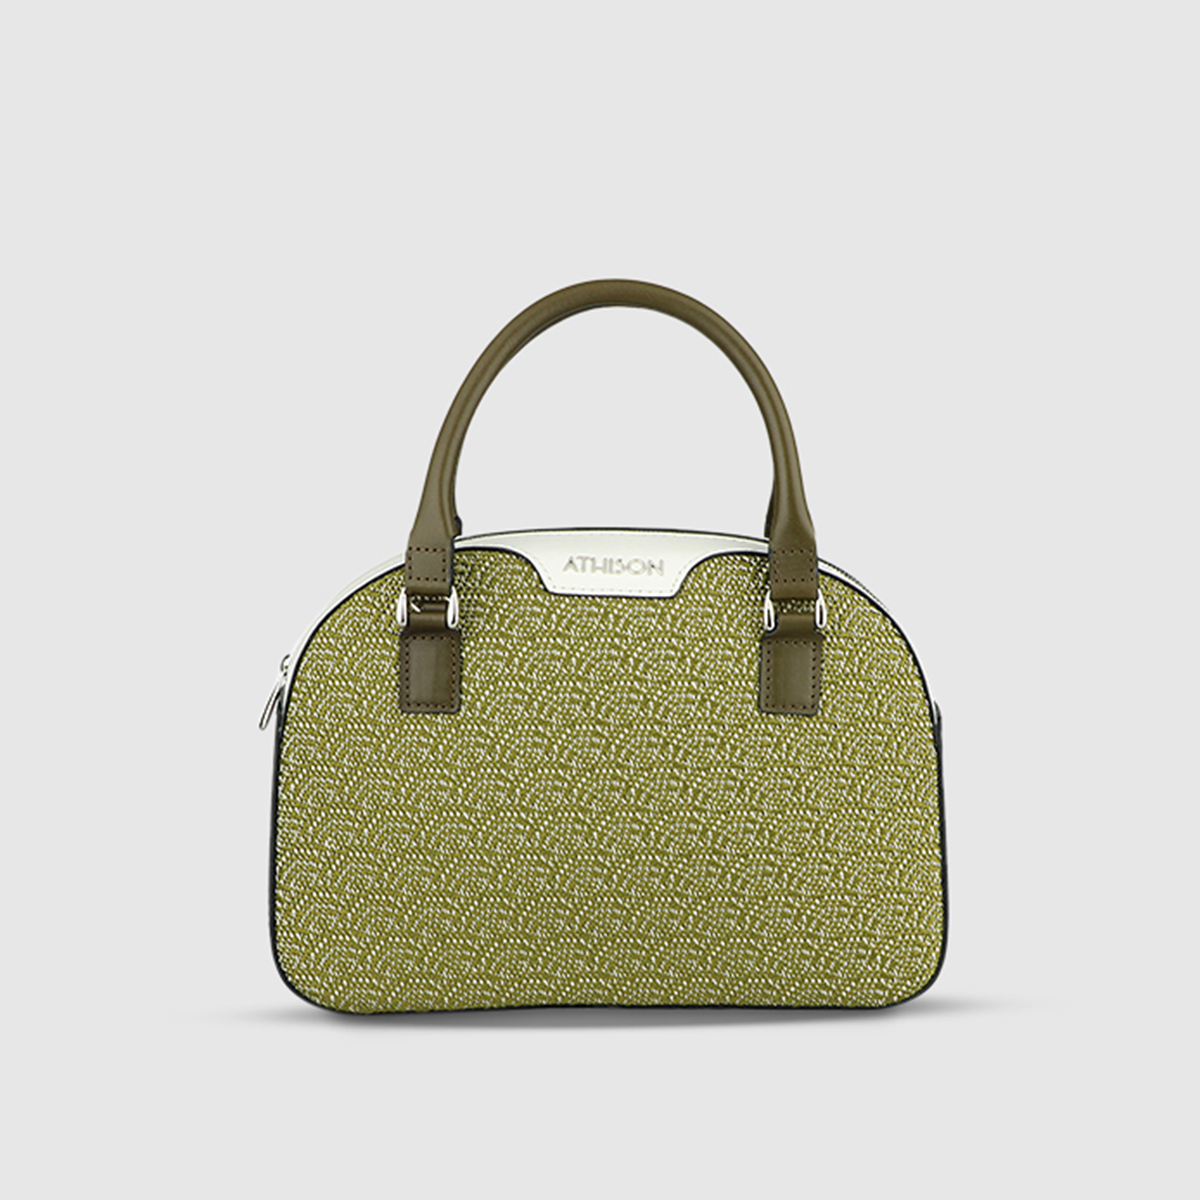 Athison Gala Leather Handbag